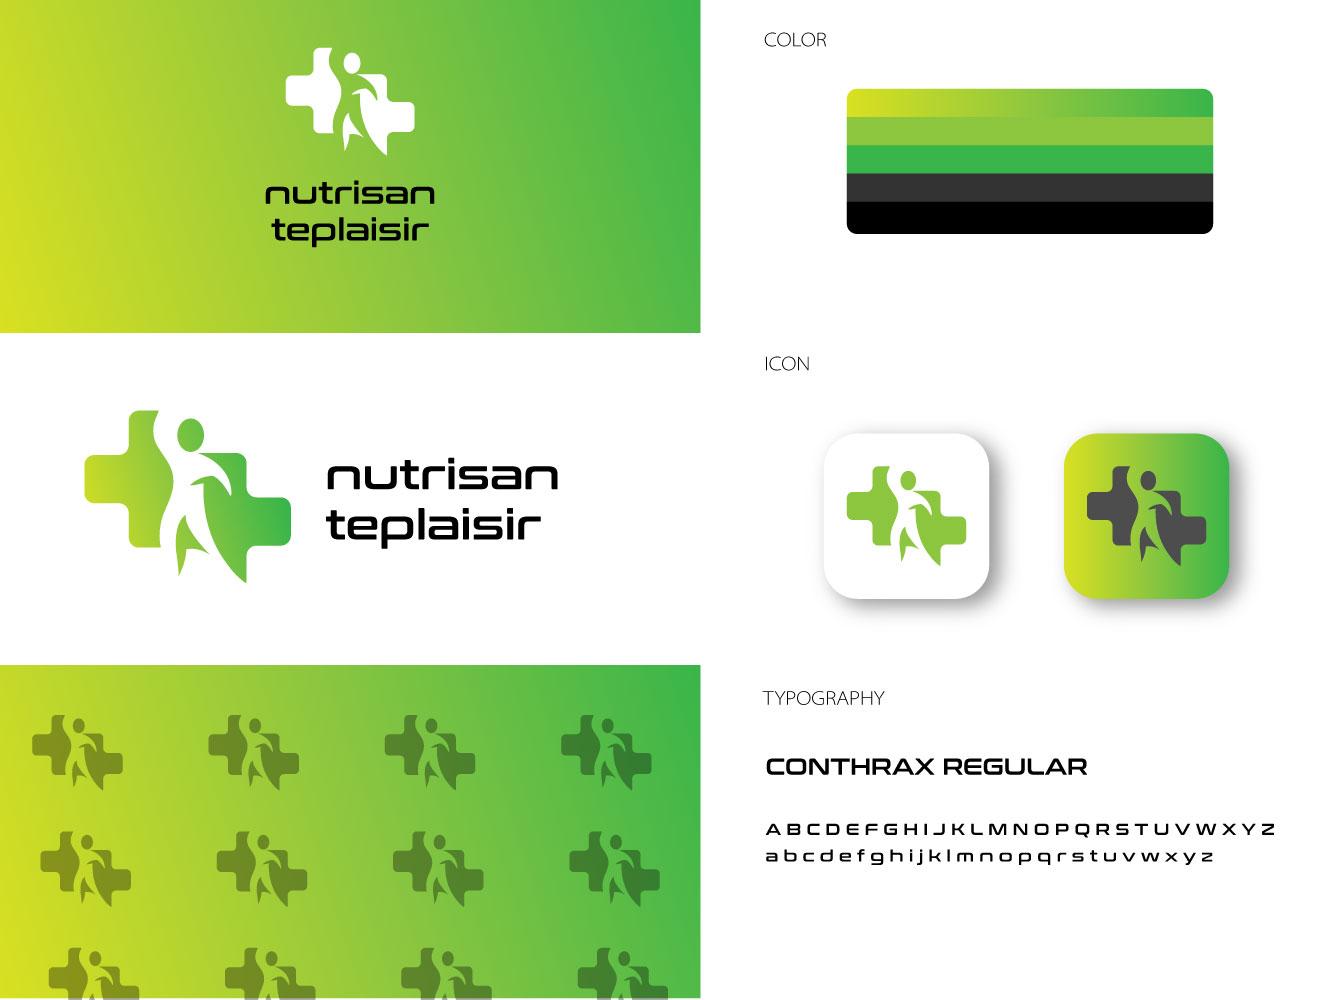 nutrisanteplaisir graphic design brand art illustrator animation app typography lettering vector promotional design poster design minimal logo icon flat illustration identity design clean branding